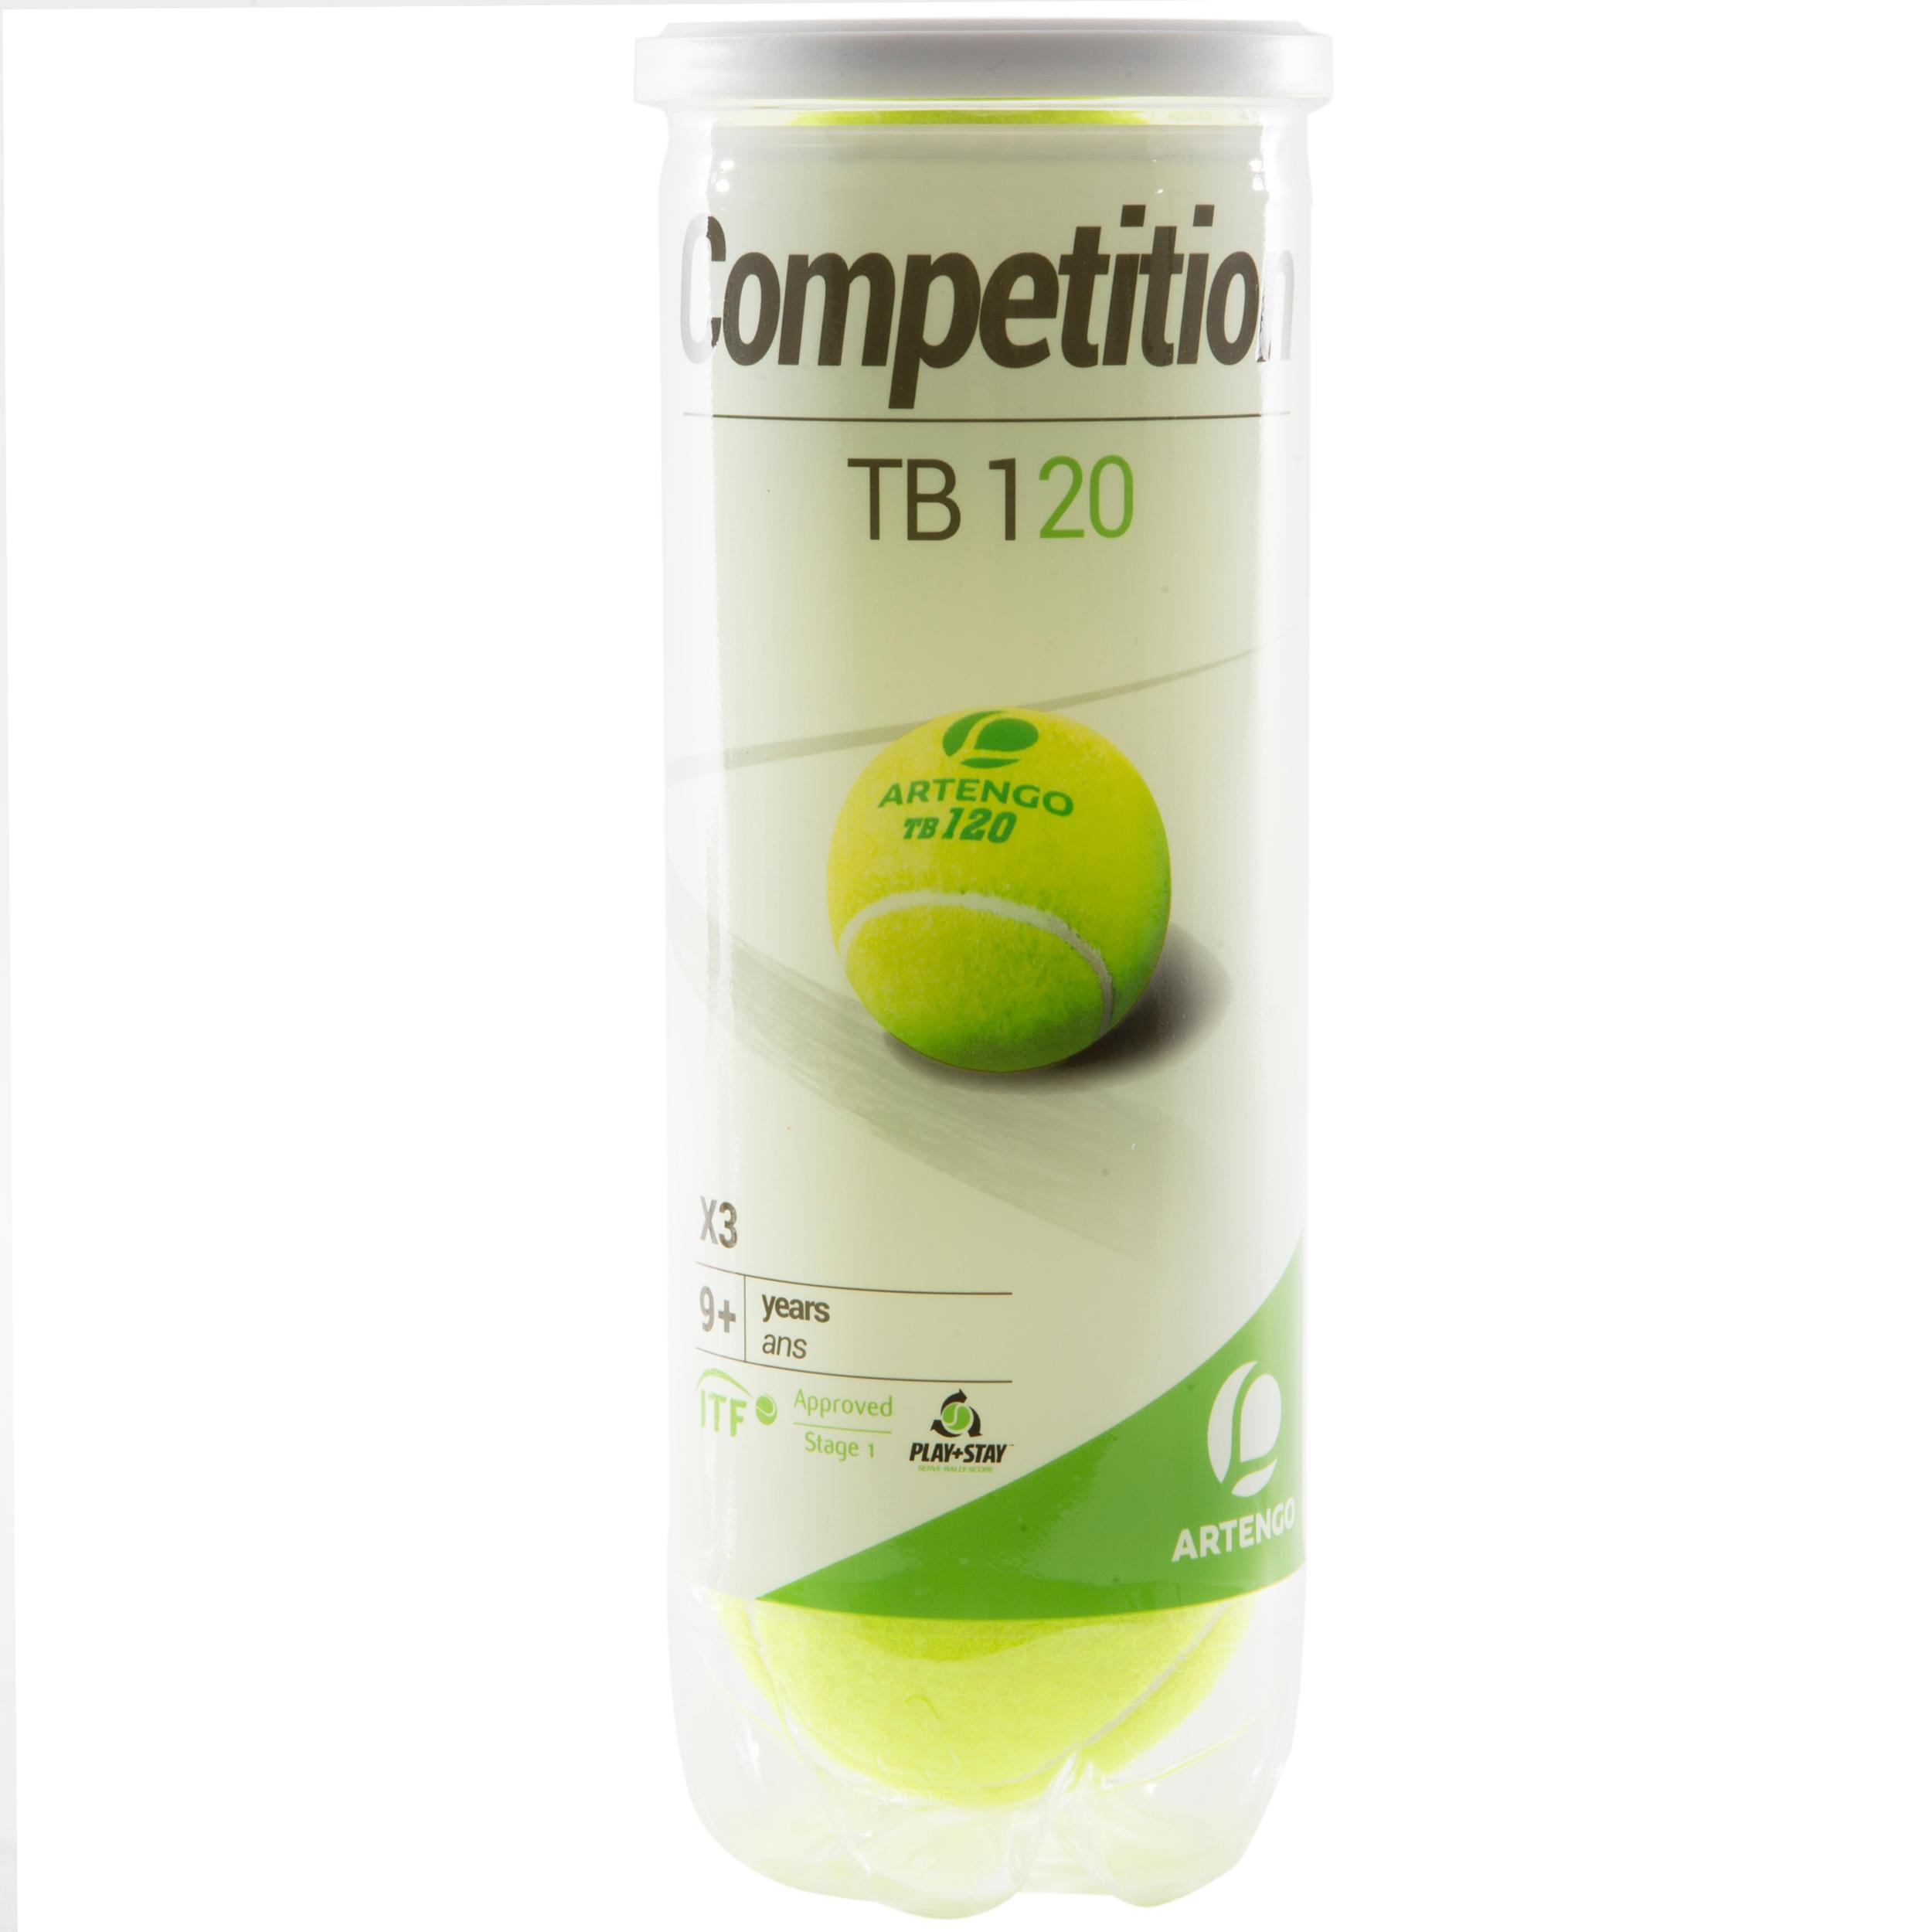 Artengo Gasgevulde tennisbal TB120 3 stuks competitie KD